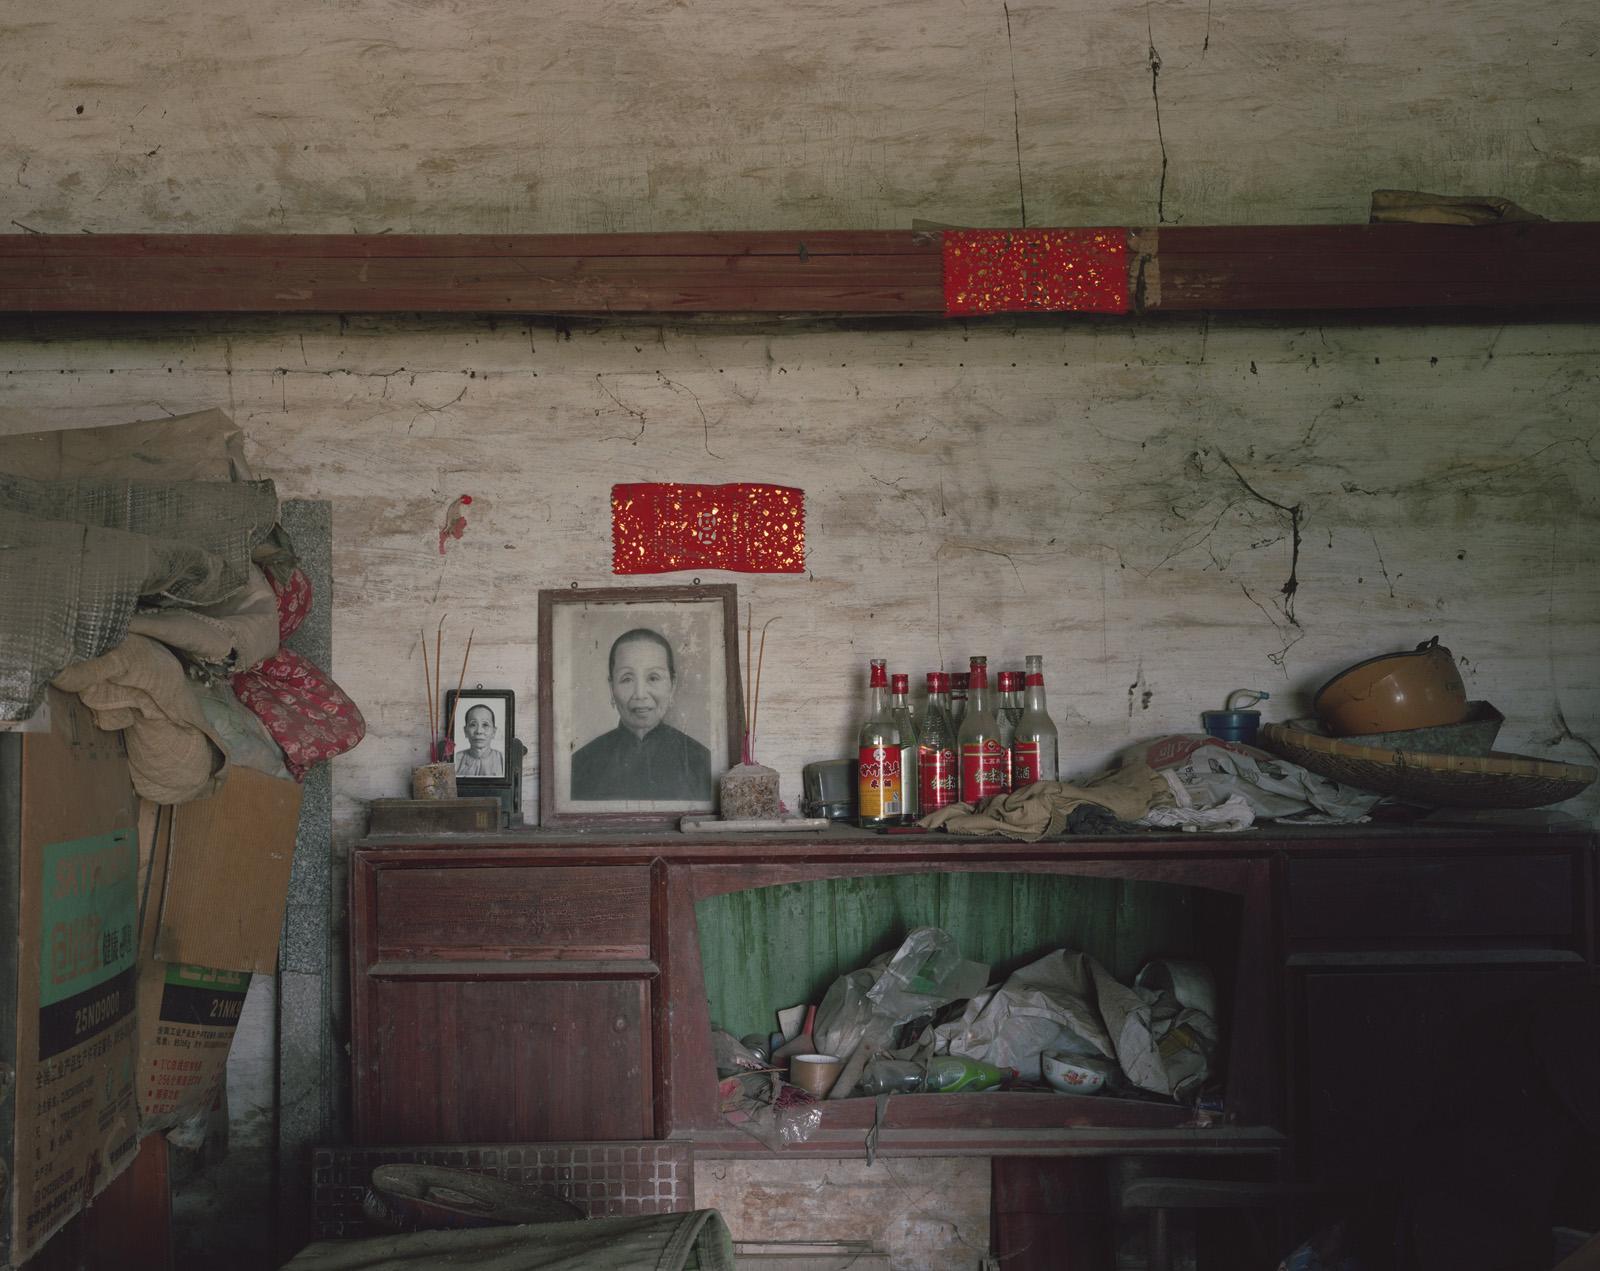 kurt-tong-photography-of-china-Combing For Ice and Jade12.jpg